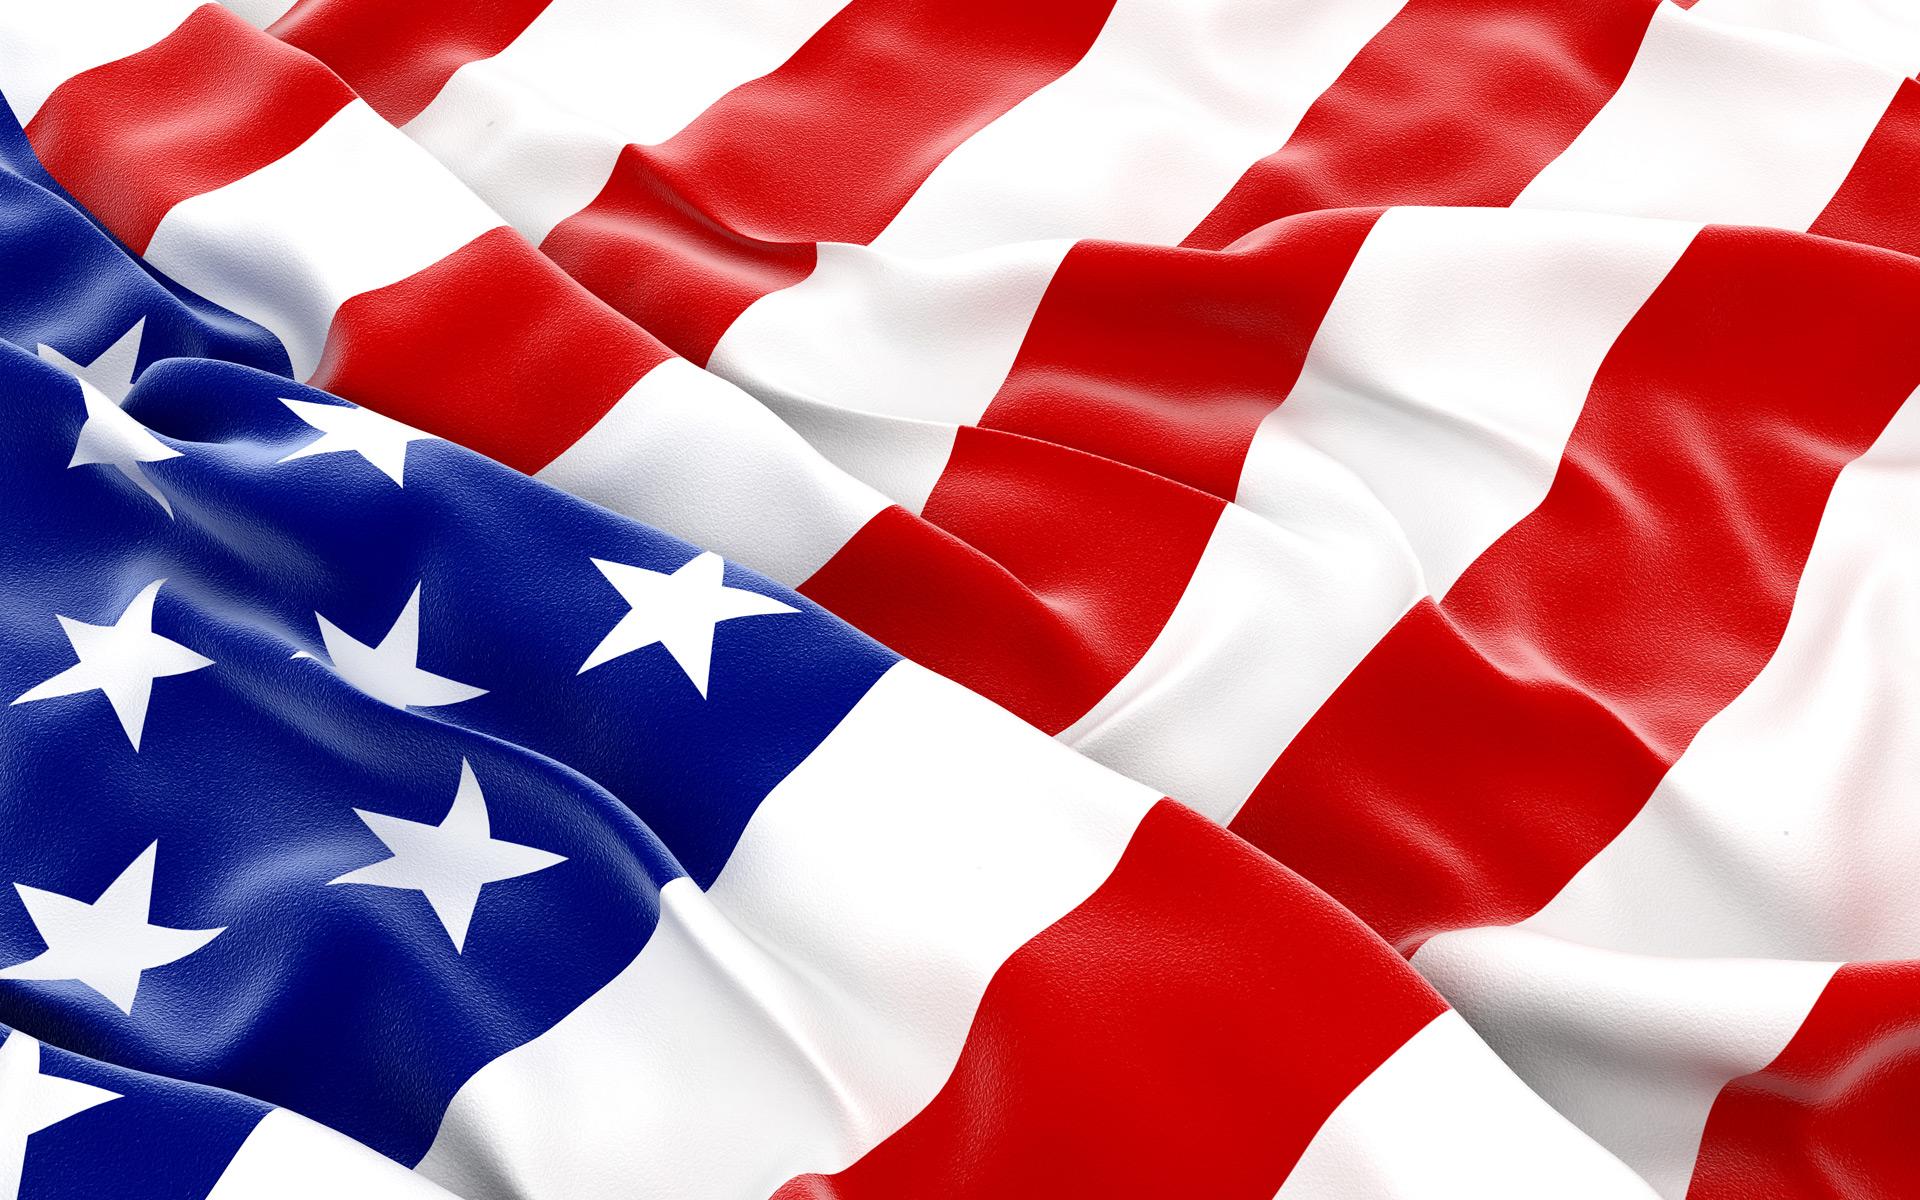 patriotic wallpaper for desktop   wwwhigh definition wallpapercom 1920x1200